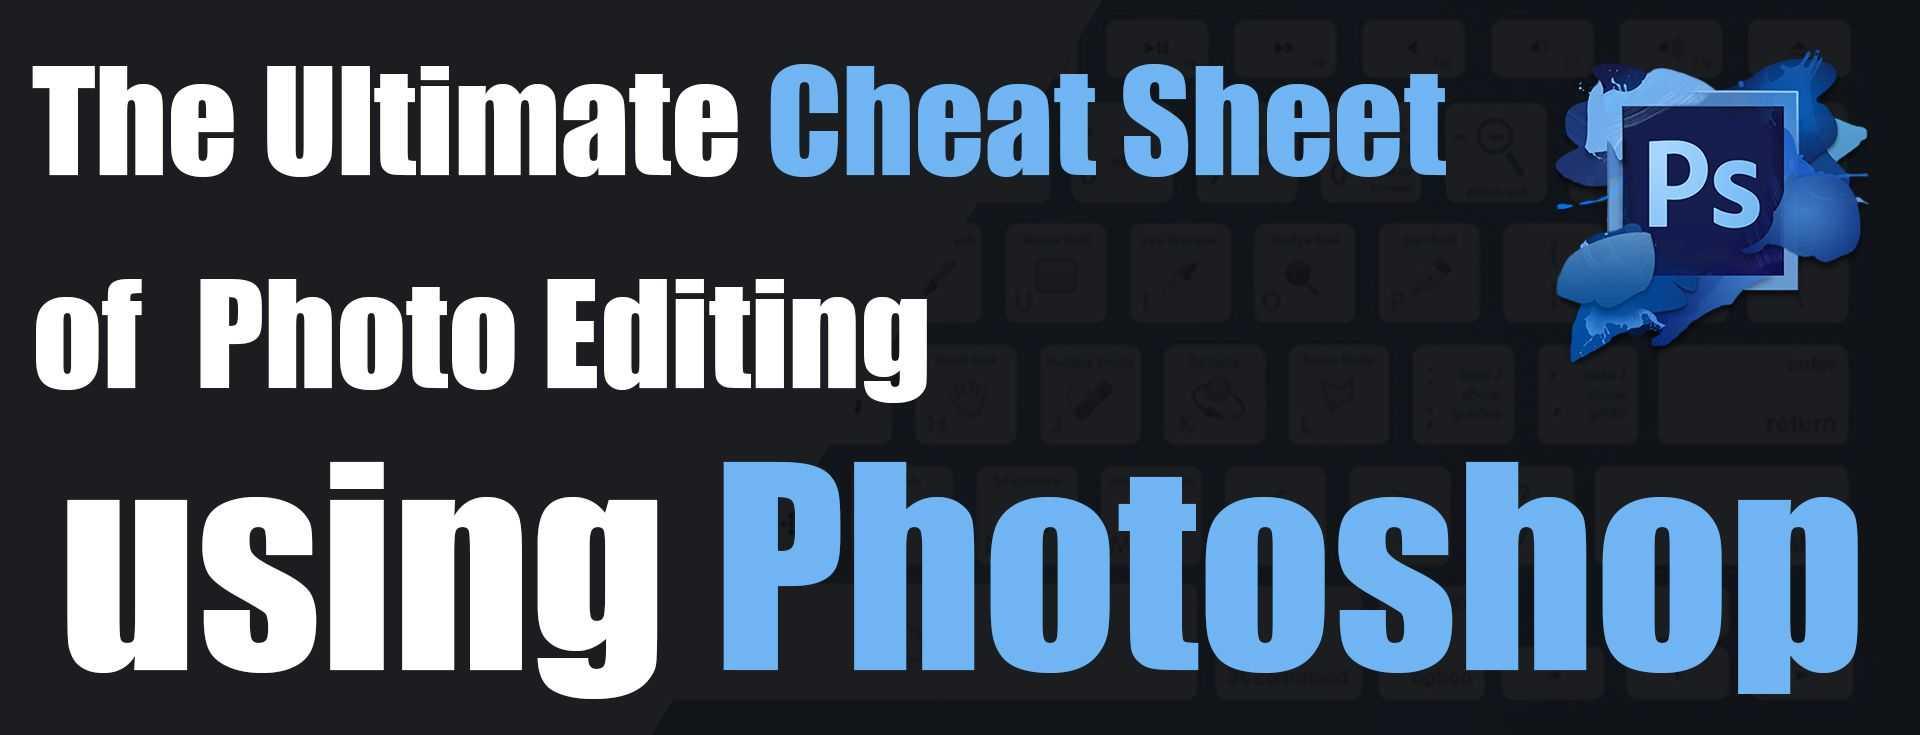 photo editing cheat sheet